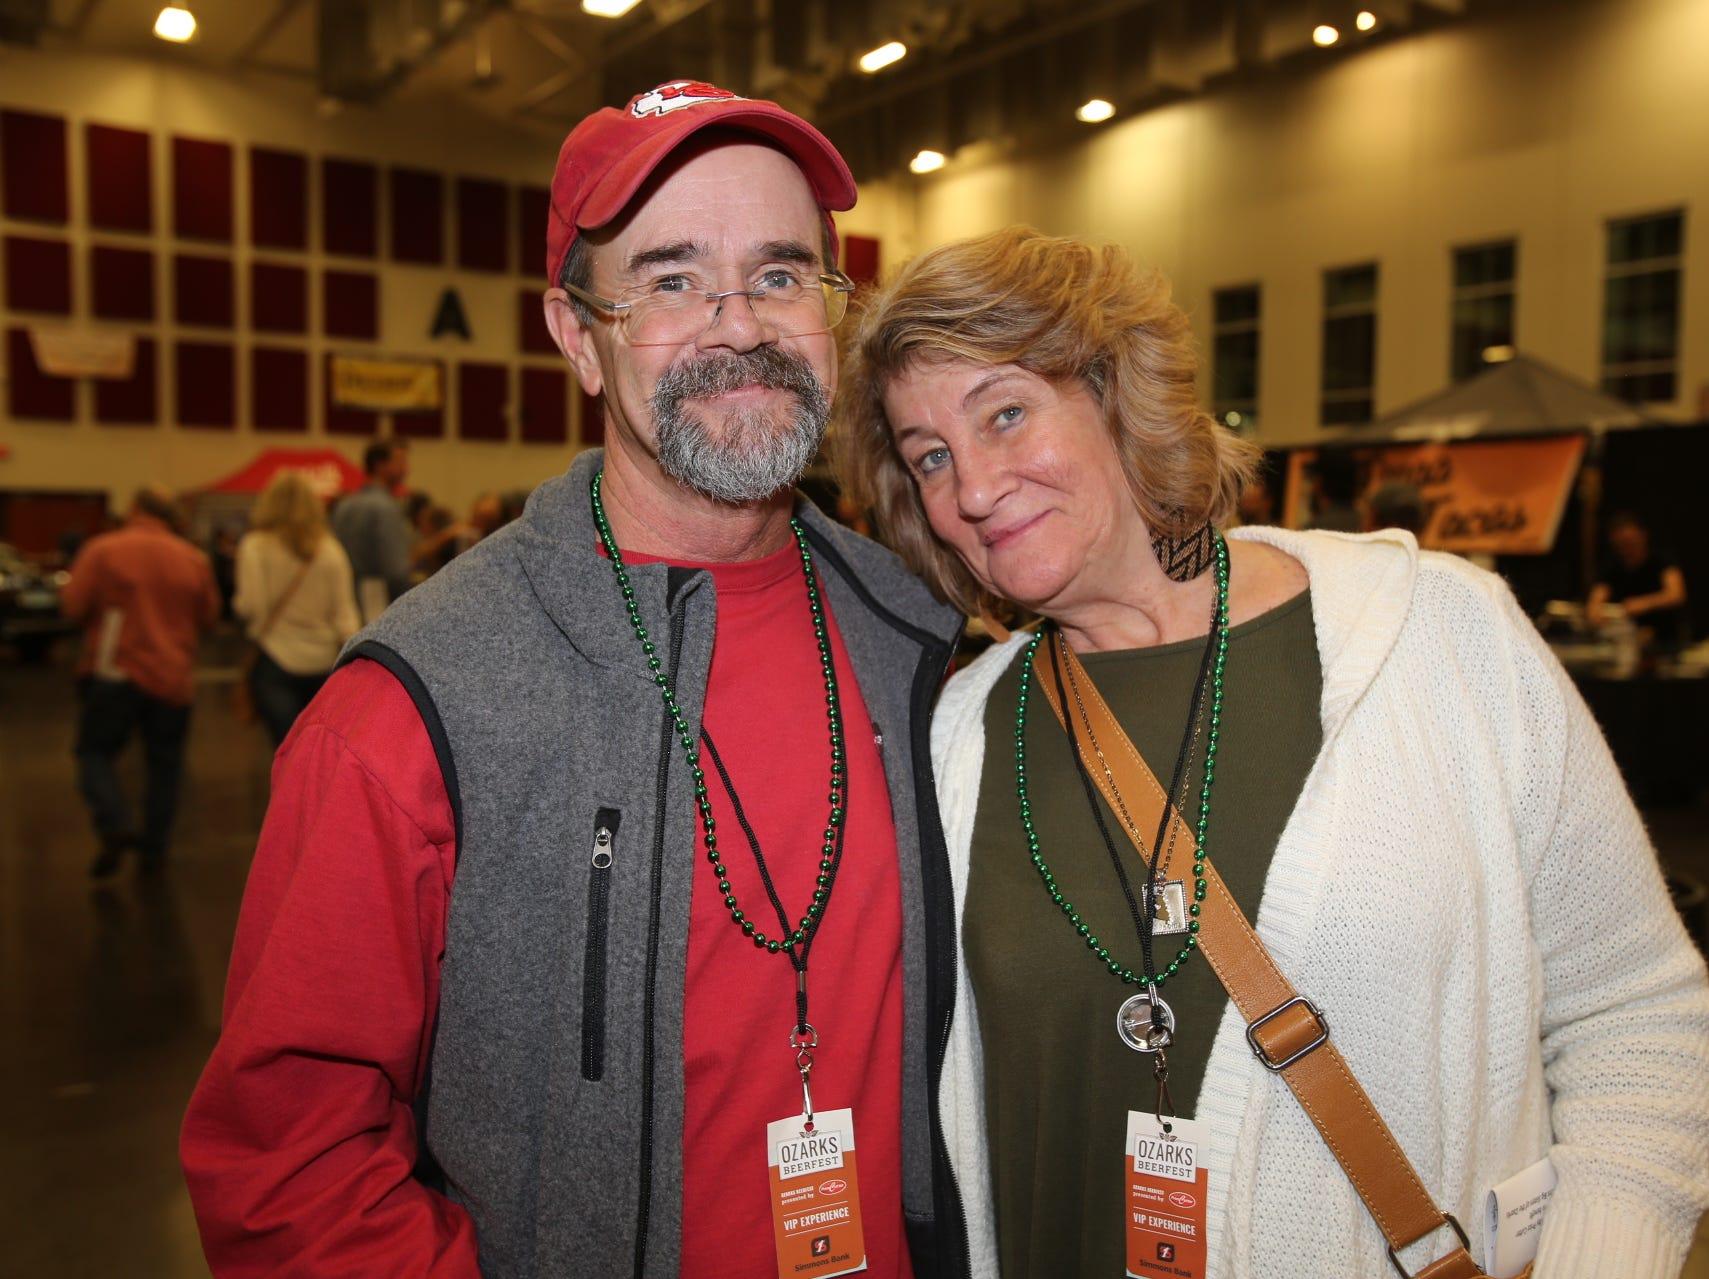 Tim and Gerri Rogers